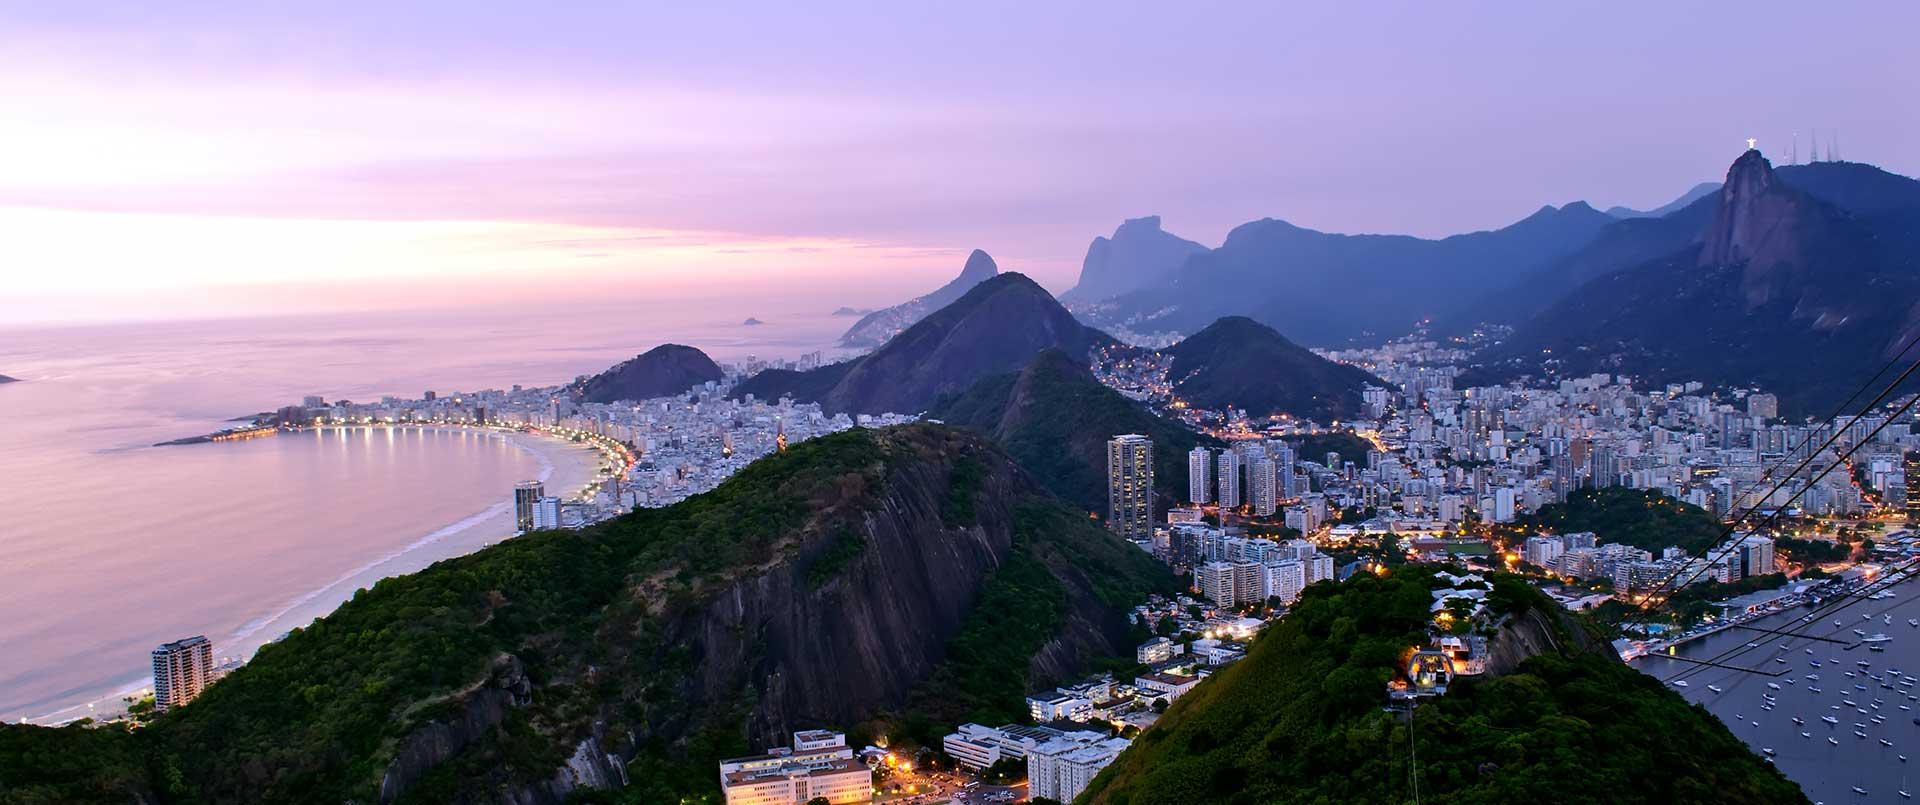 Highlights of Southern Brazil